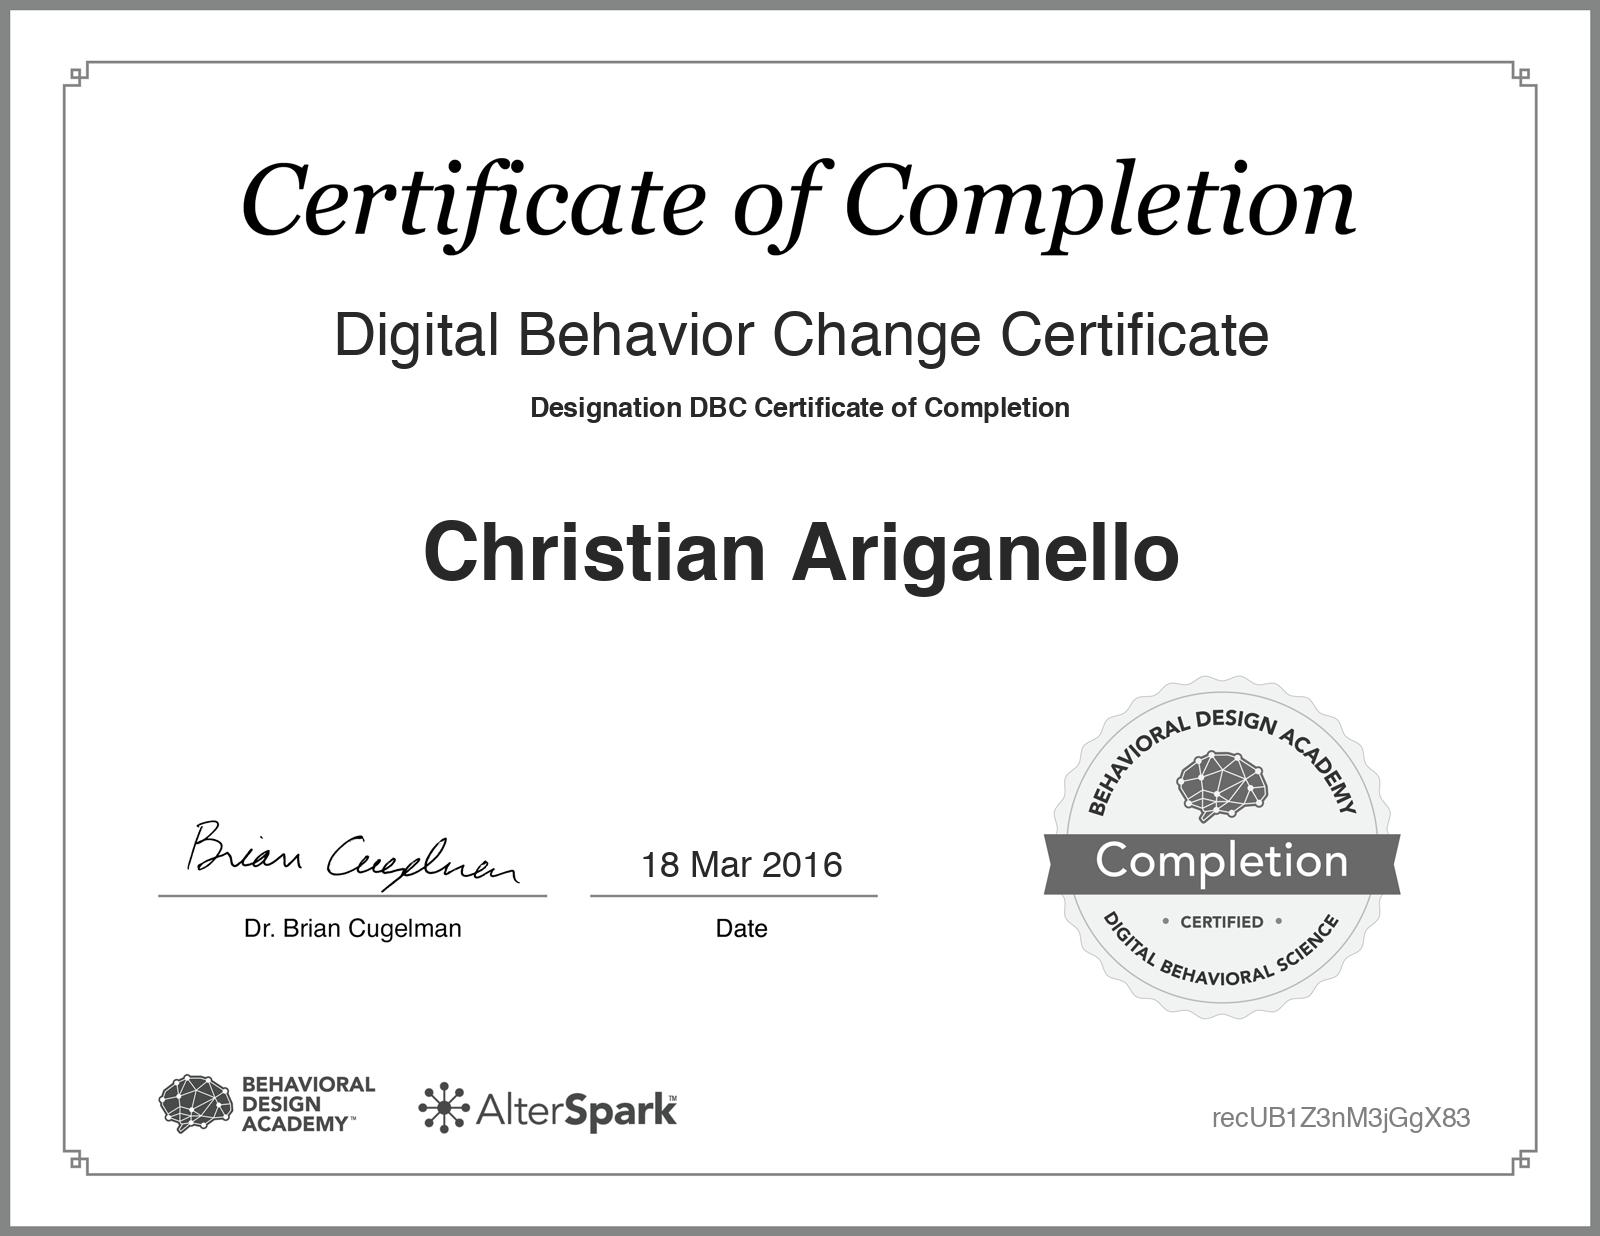 Digital Behavior Change Certificate